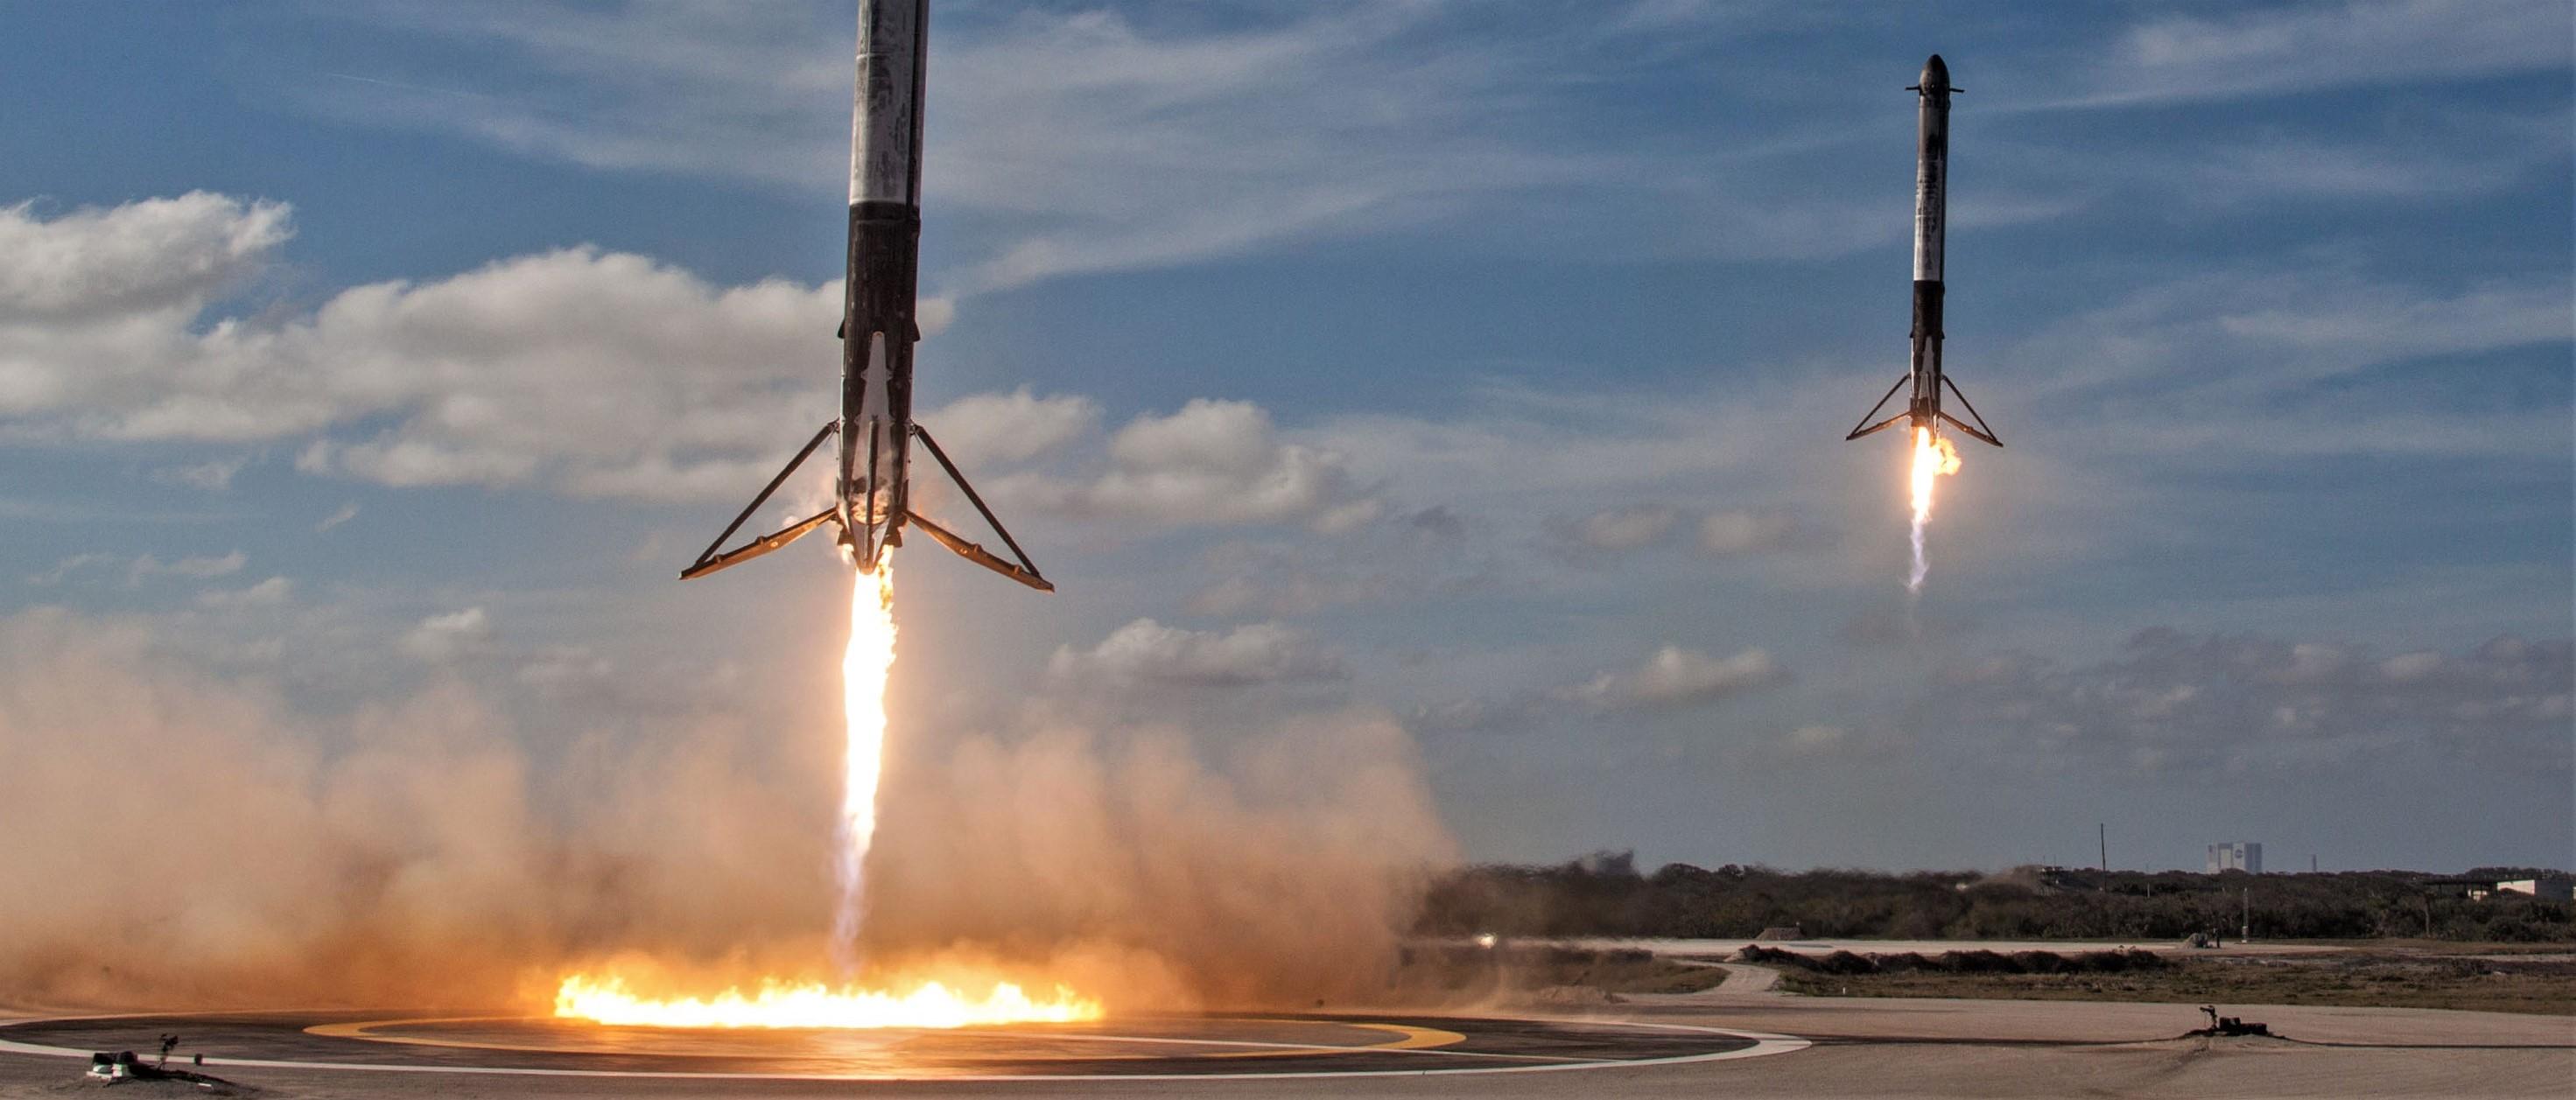 Falcon Heavy side booster landings (SpaceX) crop